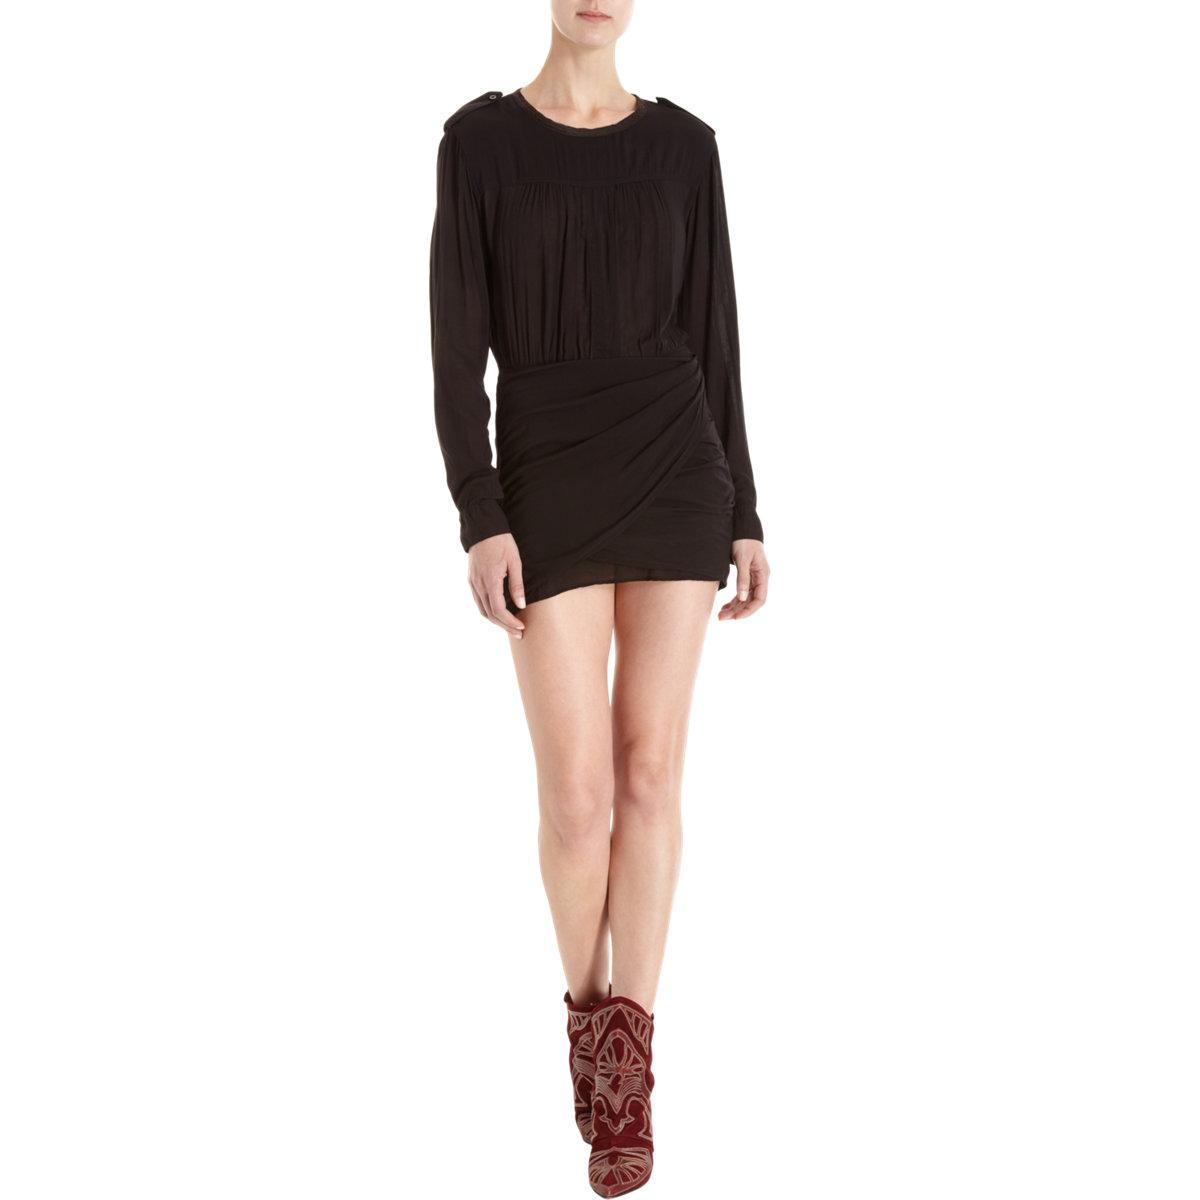 Etoile Isabel Marant Laloo Dress in Black